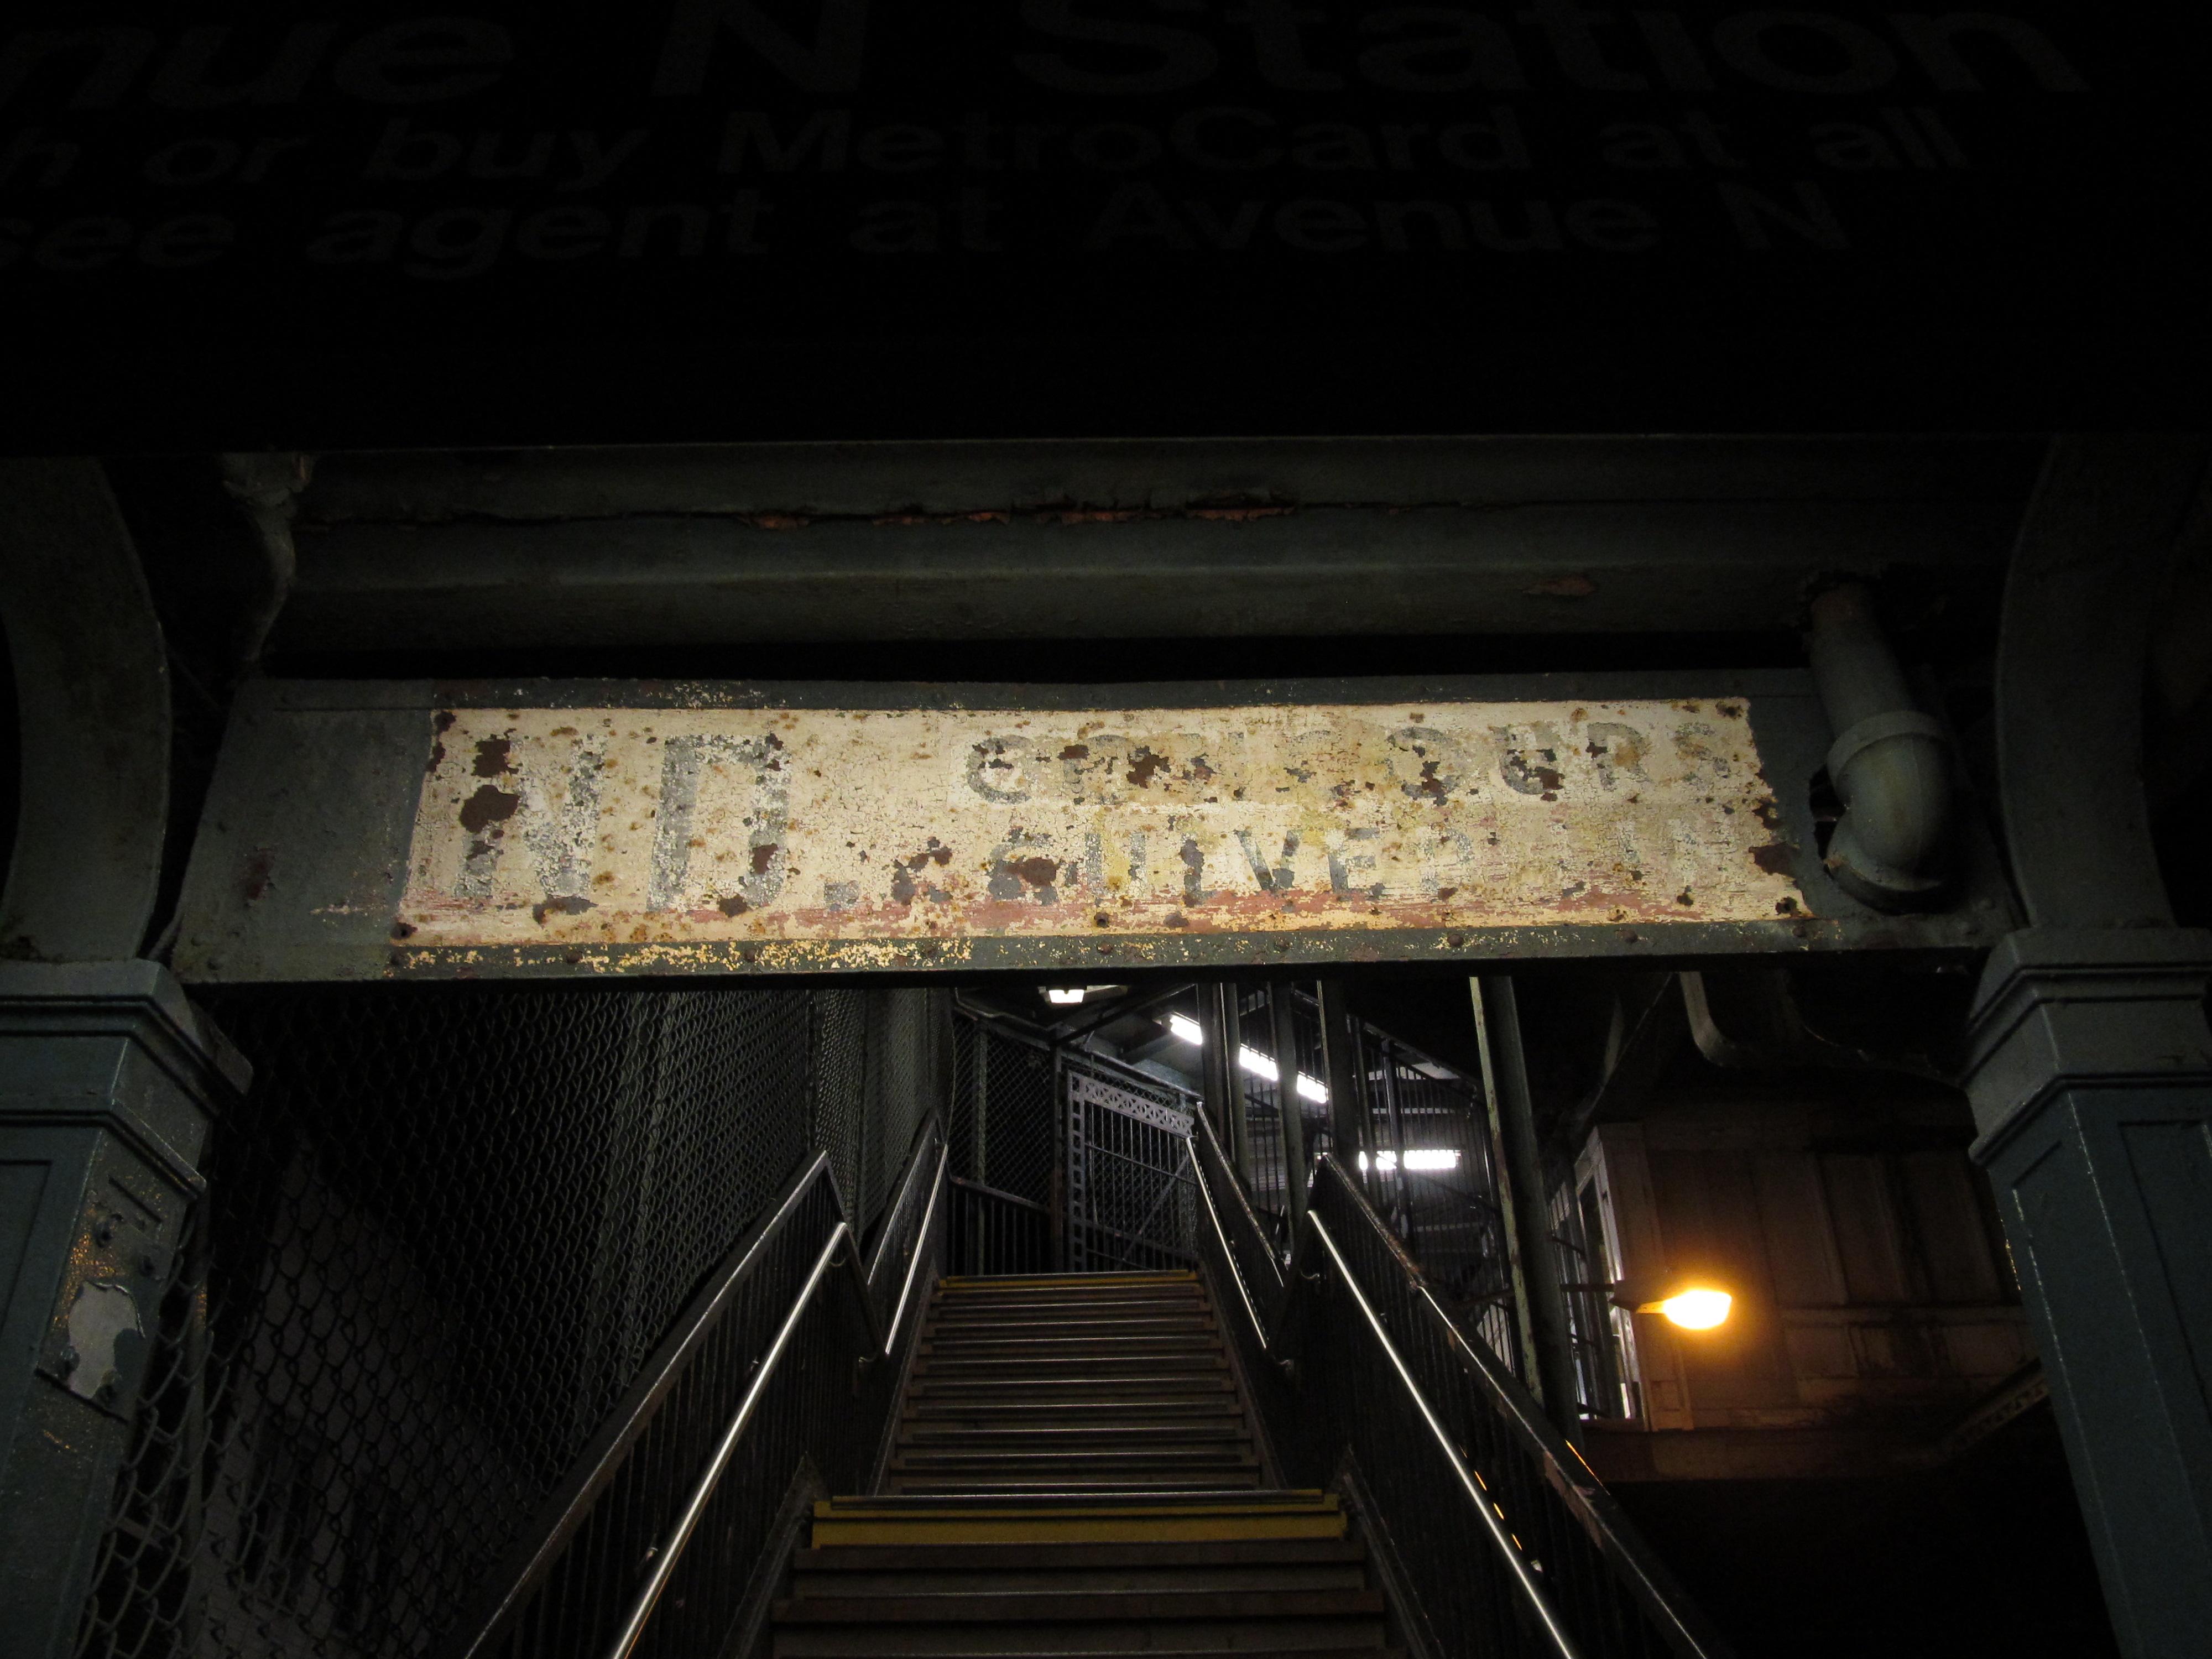 (2033k, 4000x3000)<br><b>Country:</b> United States<br><b>City:</b> New York<br><b>System:</b> New York City Transit<br><b>Line:</b> BMT Culver Line<br><b>Location:</b> Avenue N <br><b>Photo by:</b> Robbie Rosenfeld<br><b>Date:</b> 9/13/2012<br><b>Notes:</b> Old signage.<br><b>Viewed (this week/total):</b> 0 / 1412